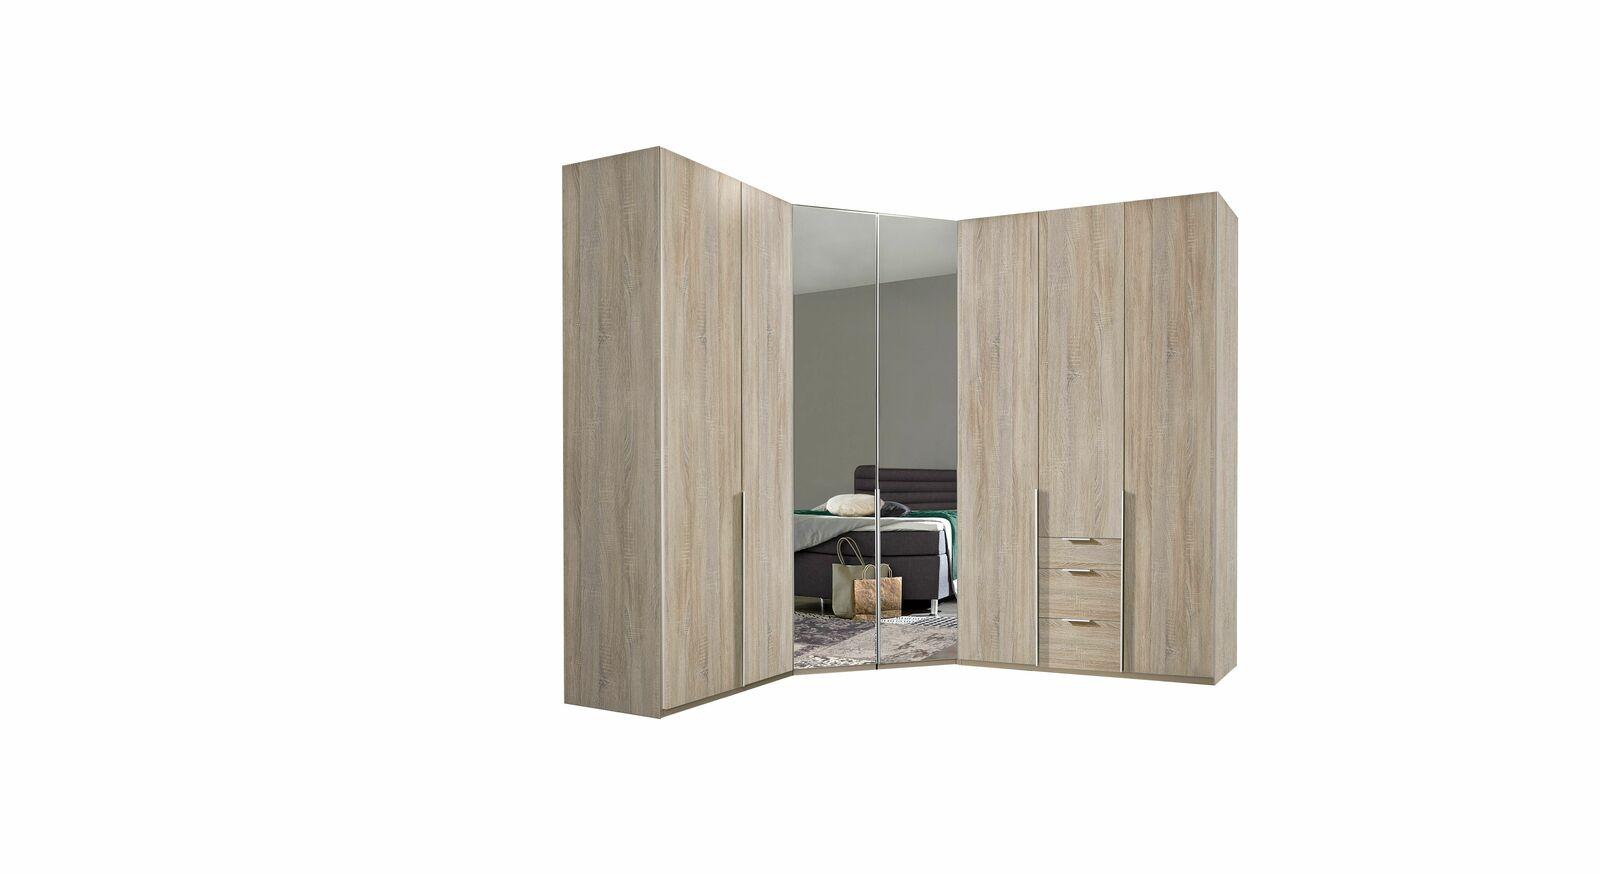 Eck-Kleiderschrank Coreno in zeitlosem Design-Look